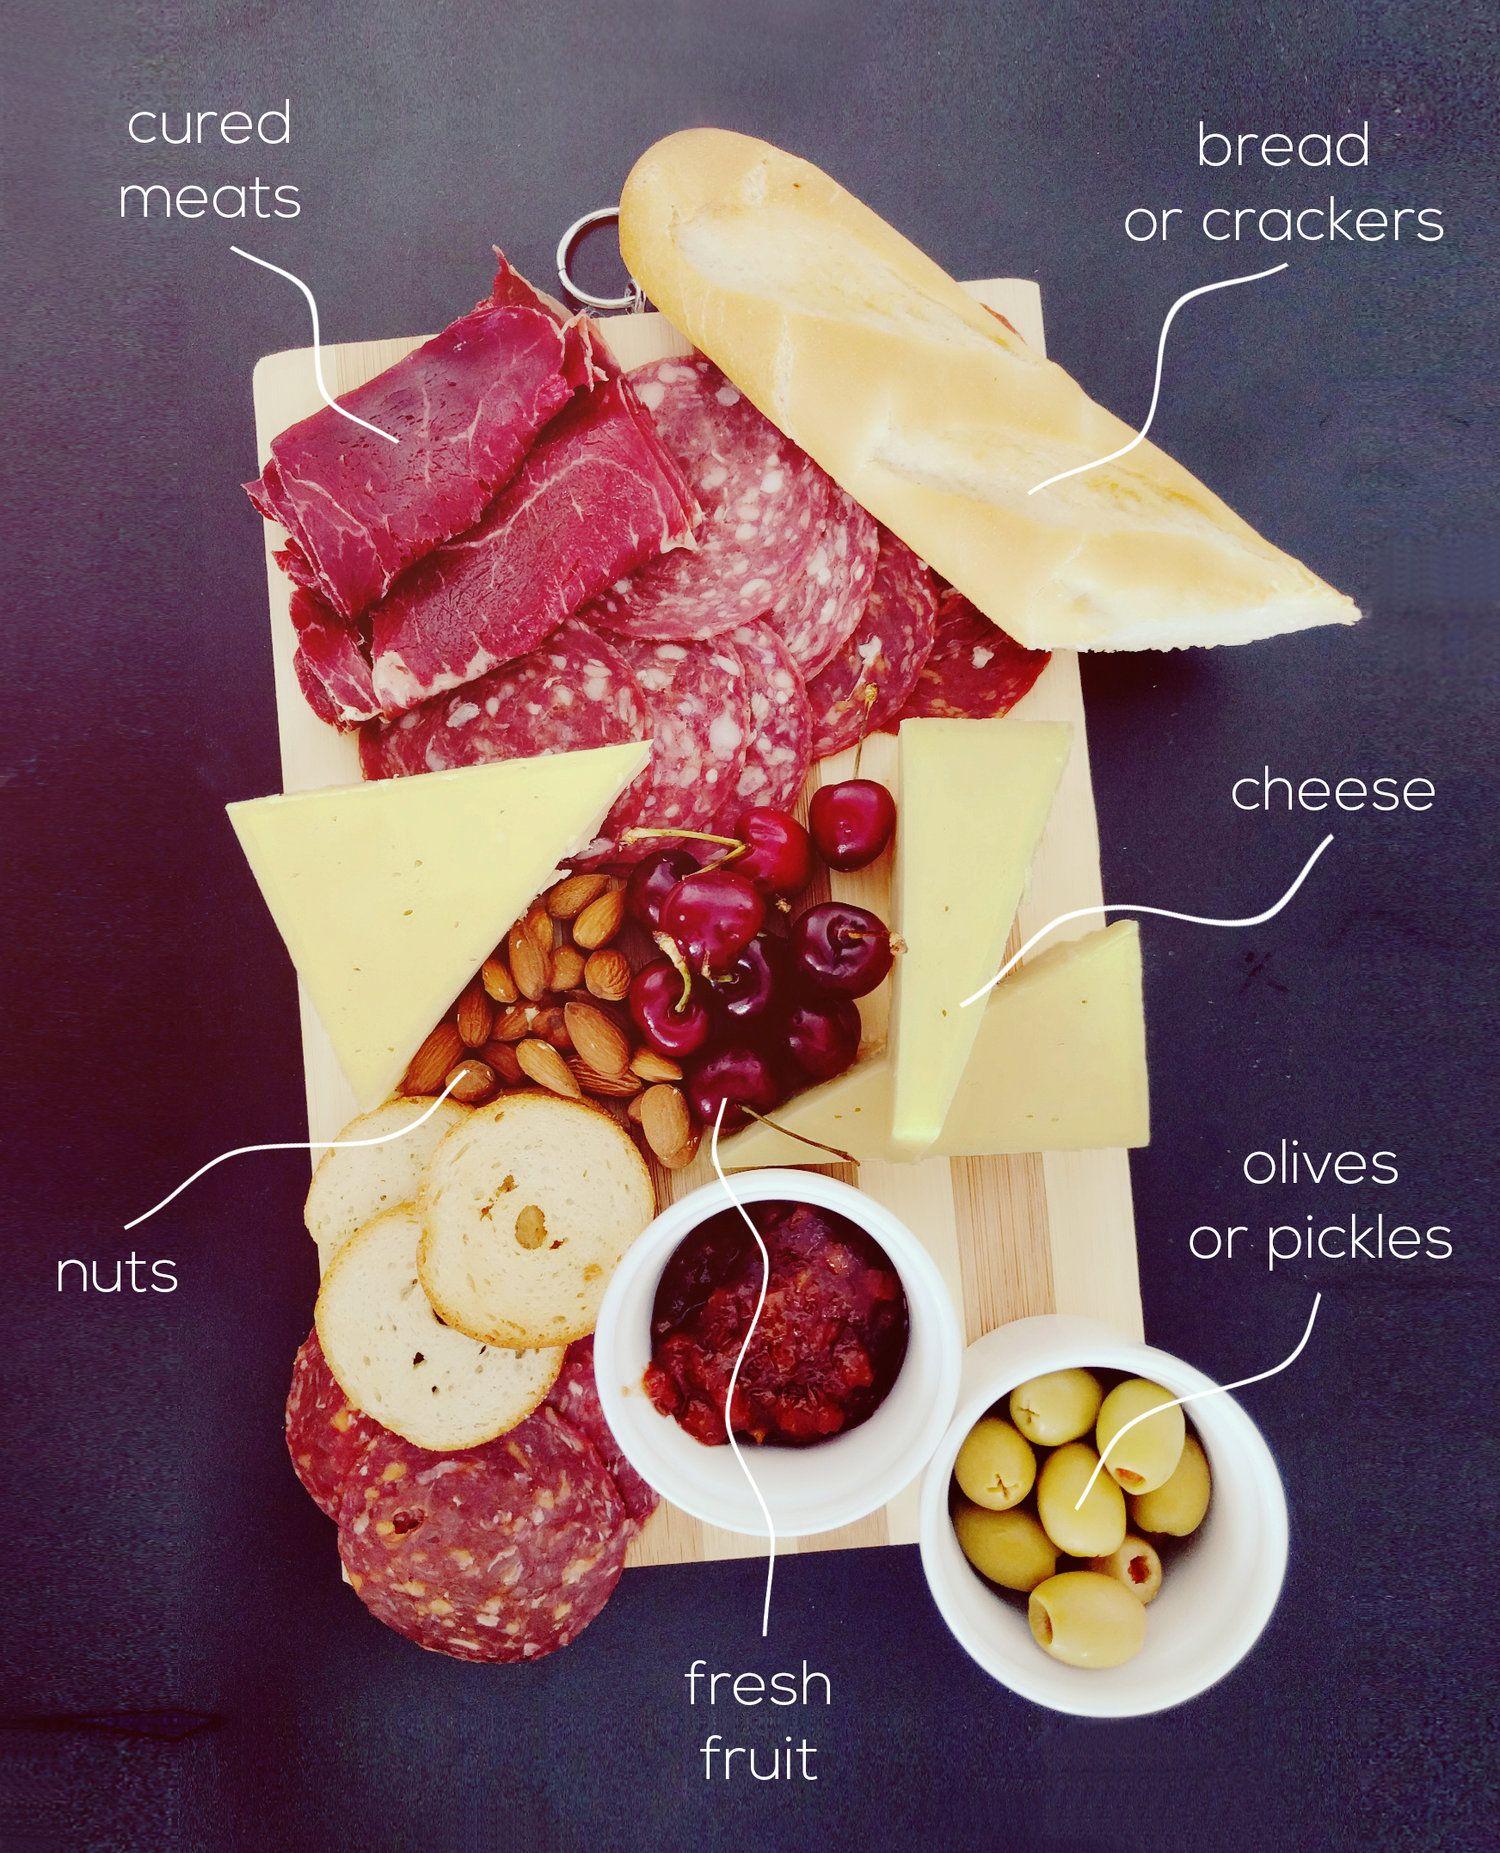 Create Your Own Halal Charcuterie Board Halal Recipes Halal Food Festival Charcuterie Board